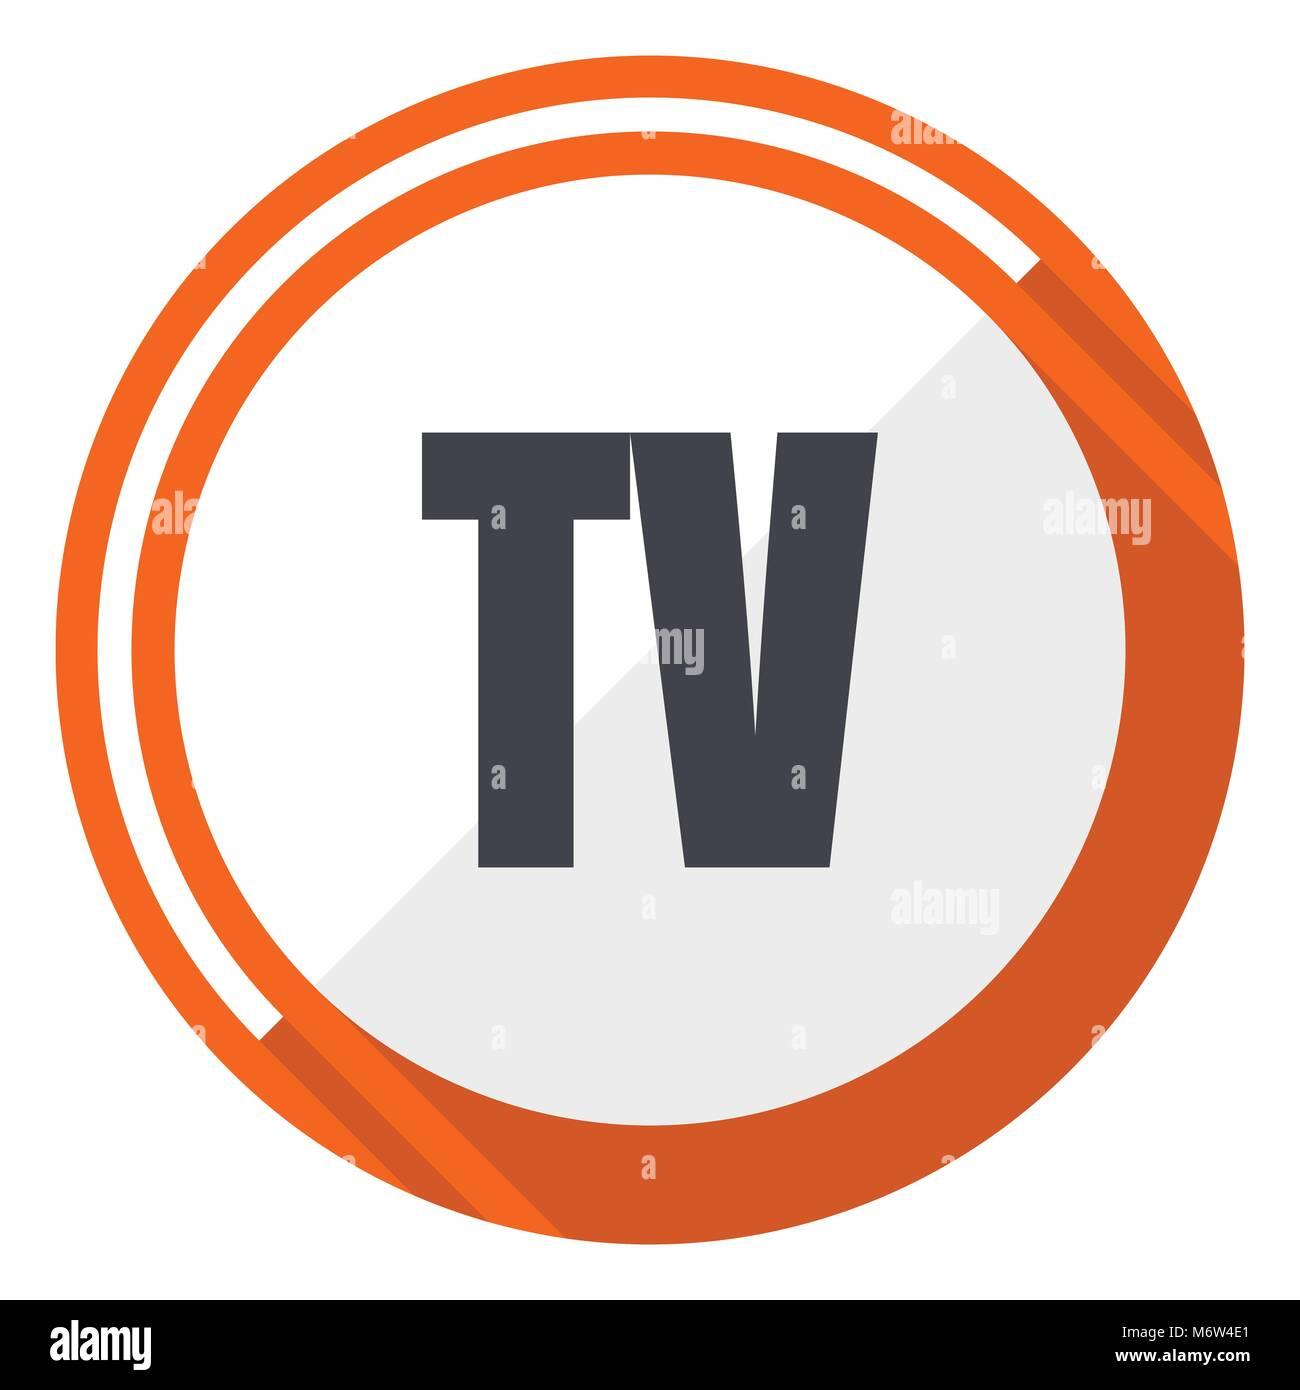 Tv vector icon - Stock Image